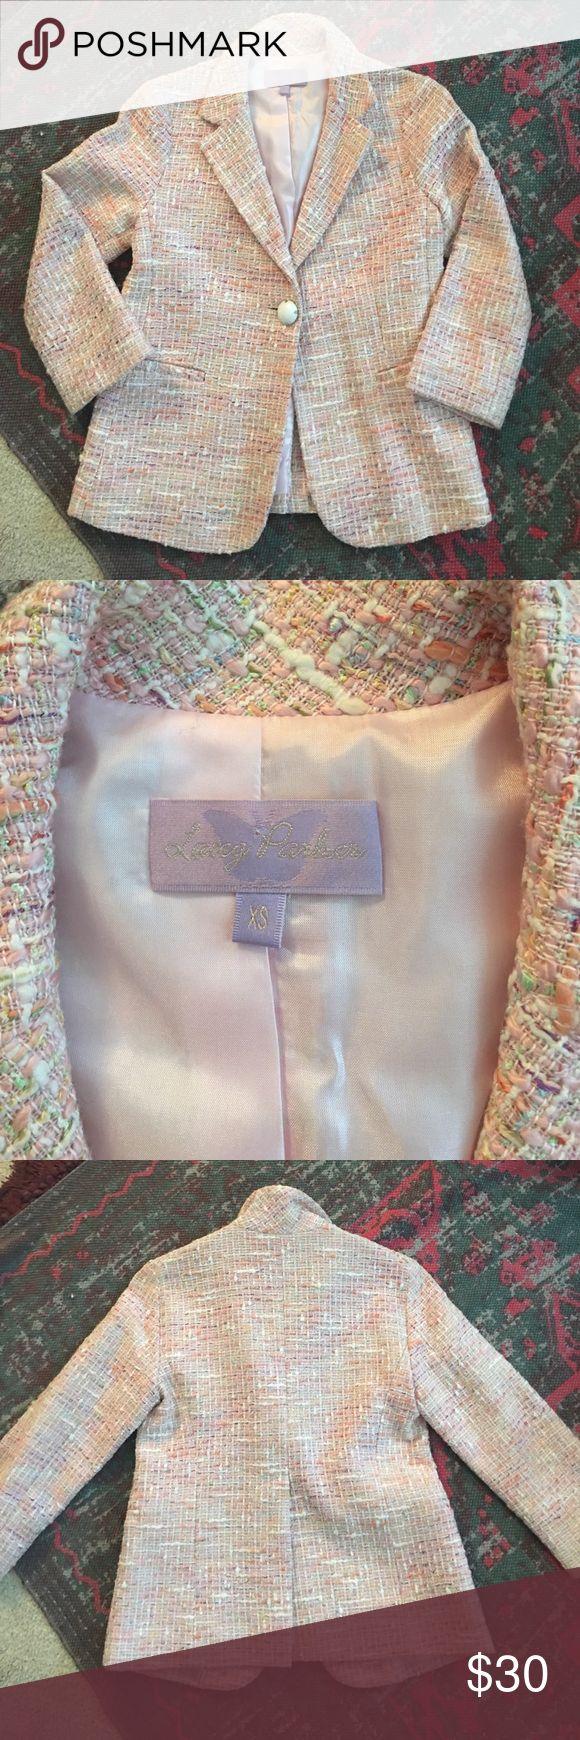 INTERMIX Lacey Parker tweed jacket Pink tweed blazer XS perfect condition intermix lacey Parker Jackets & Coats Blazers